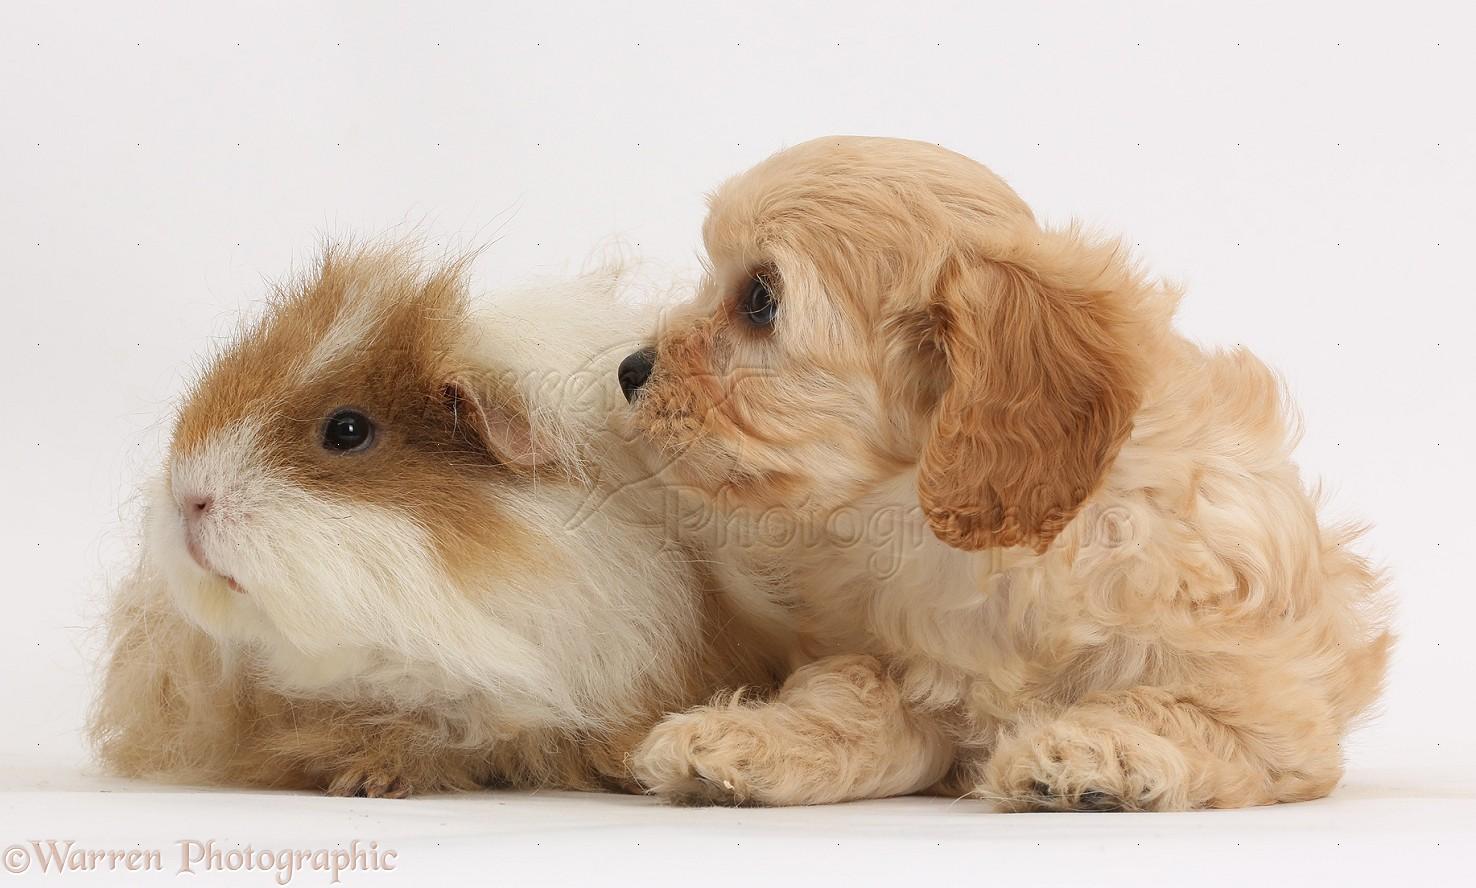 Cute Cavapoo Pup And Shaggy 1476x888